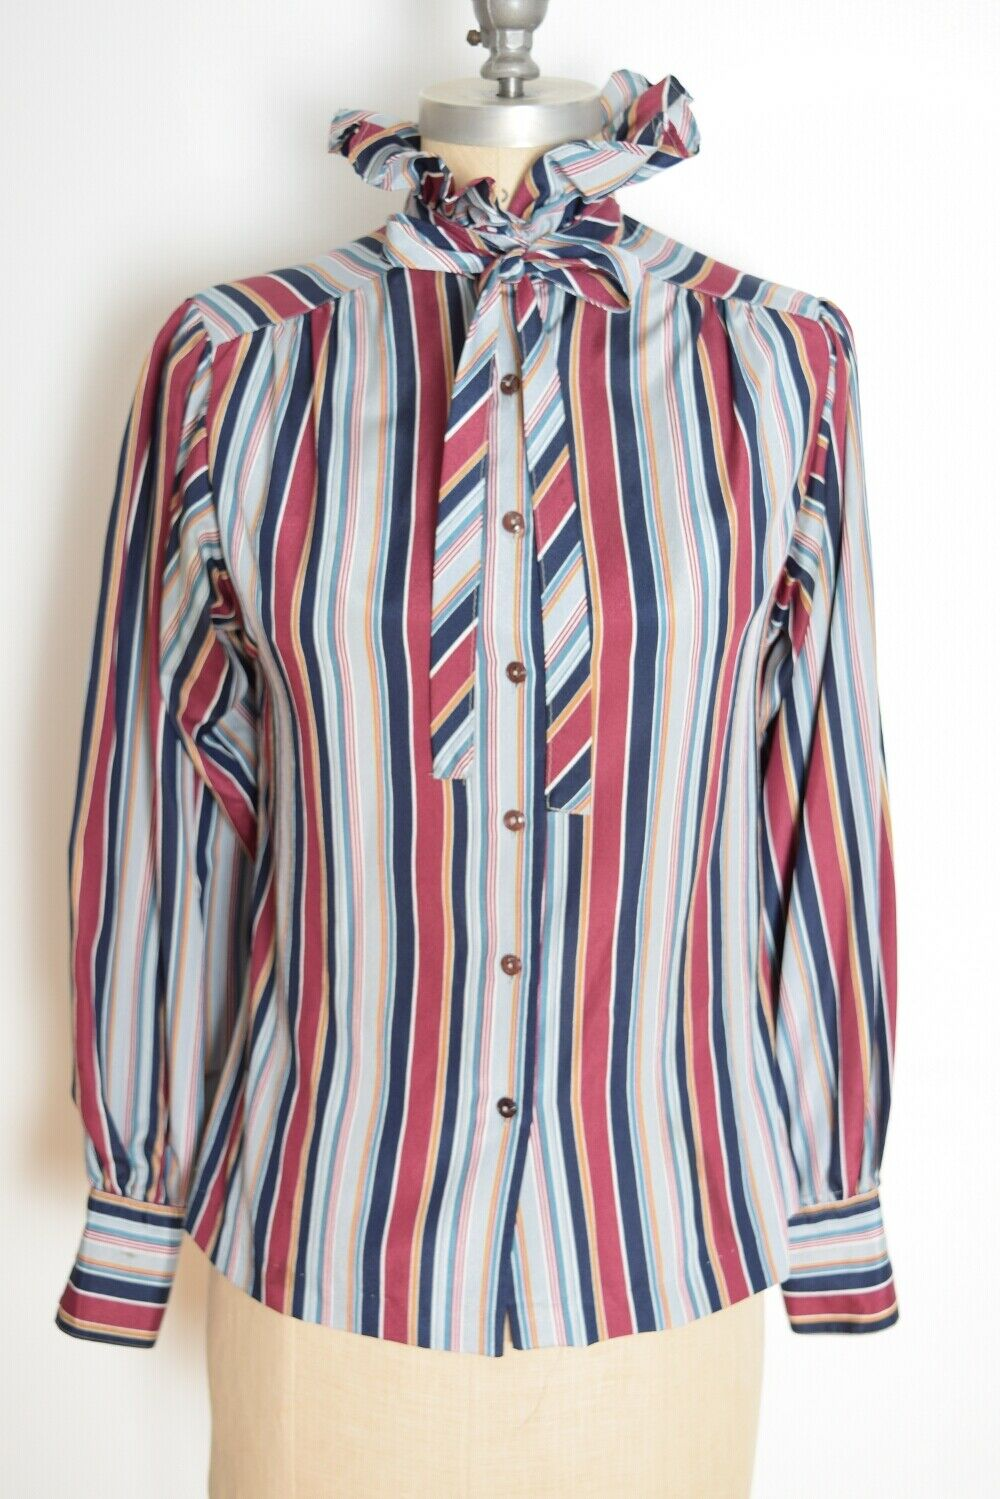 vintage gray striped bow blouse 1970s ascot tie secretary button down medium large